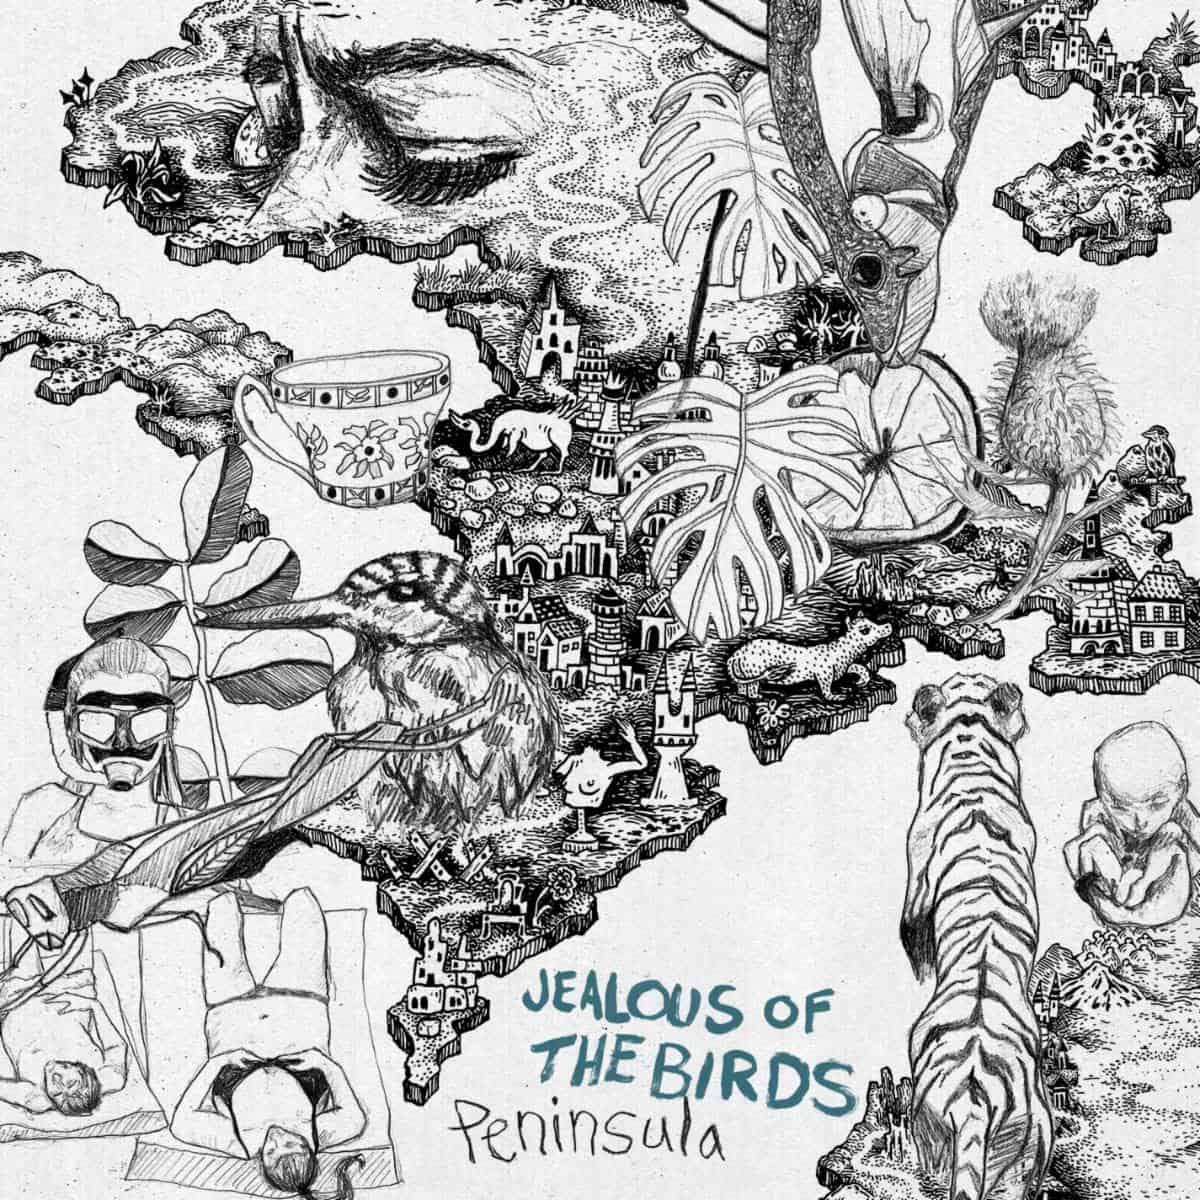 Jealous of the Birds Peninsula Album Art